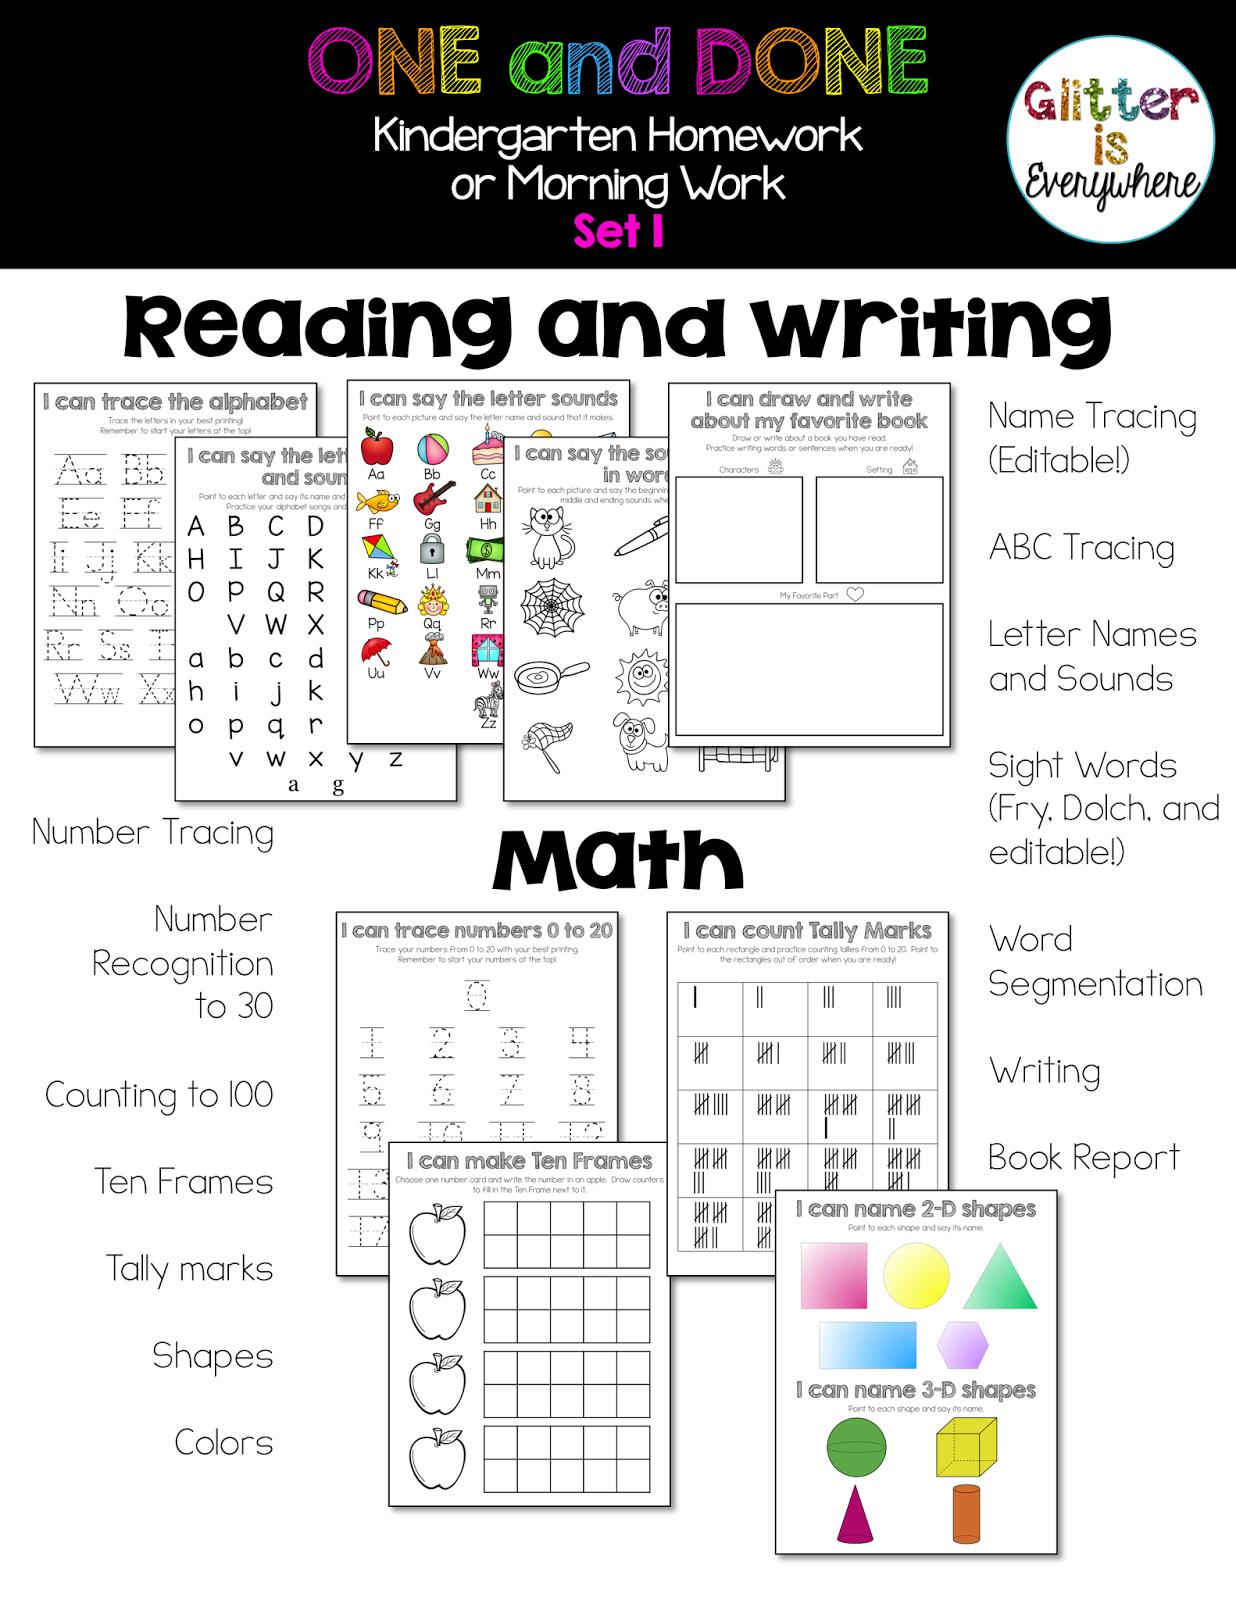 One And Done Kindergarten Homework Or Morning Work